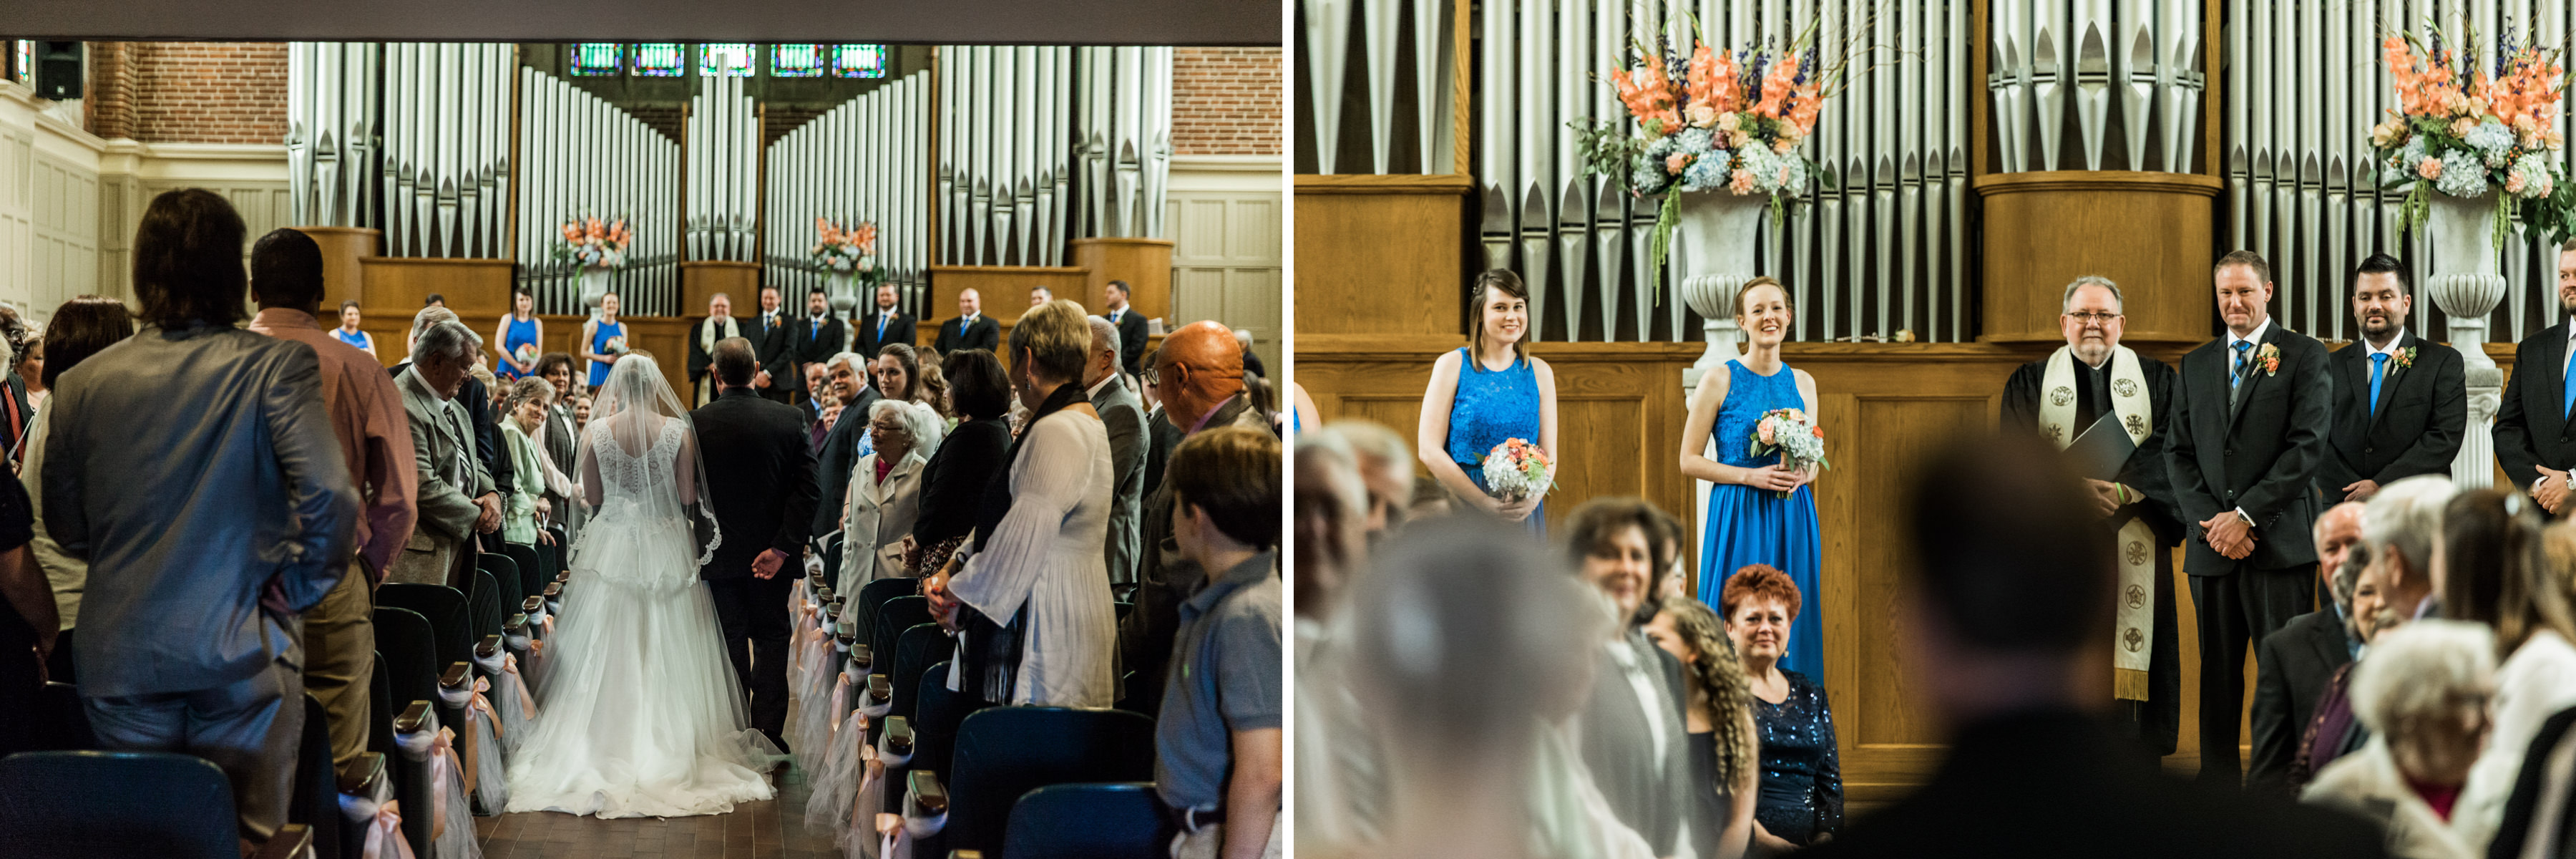 MAULDIN_WEDDING_MONTGOMERY_ALABAMA_WEDDING_PHOTOGRAPHY_58